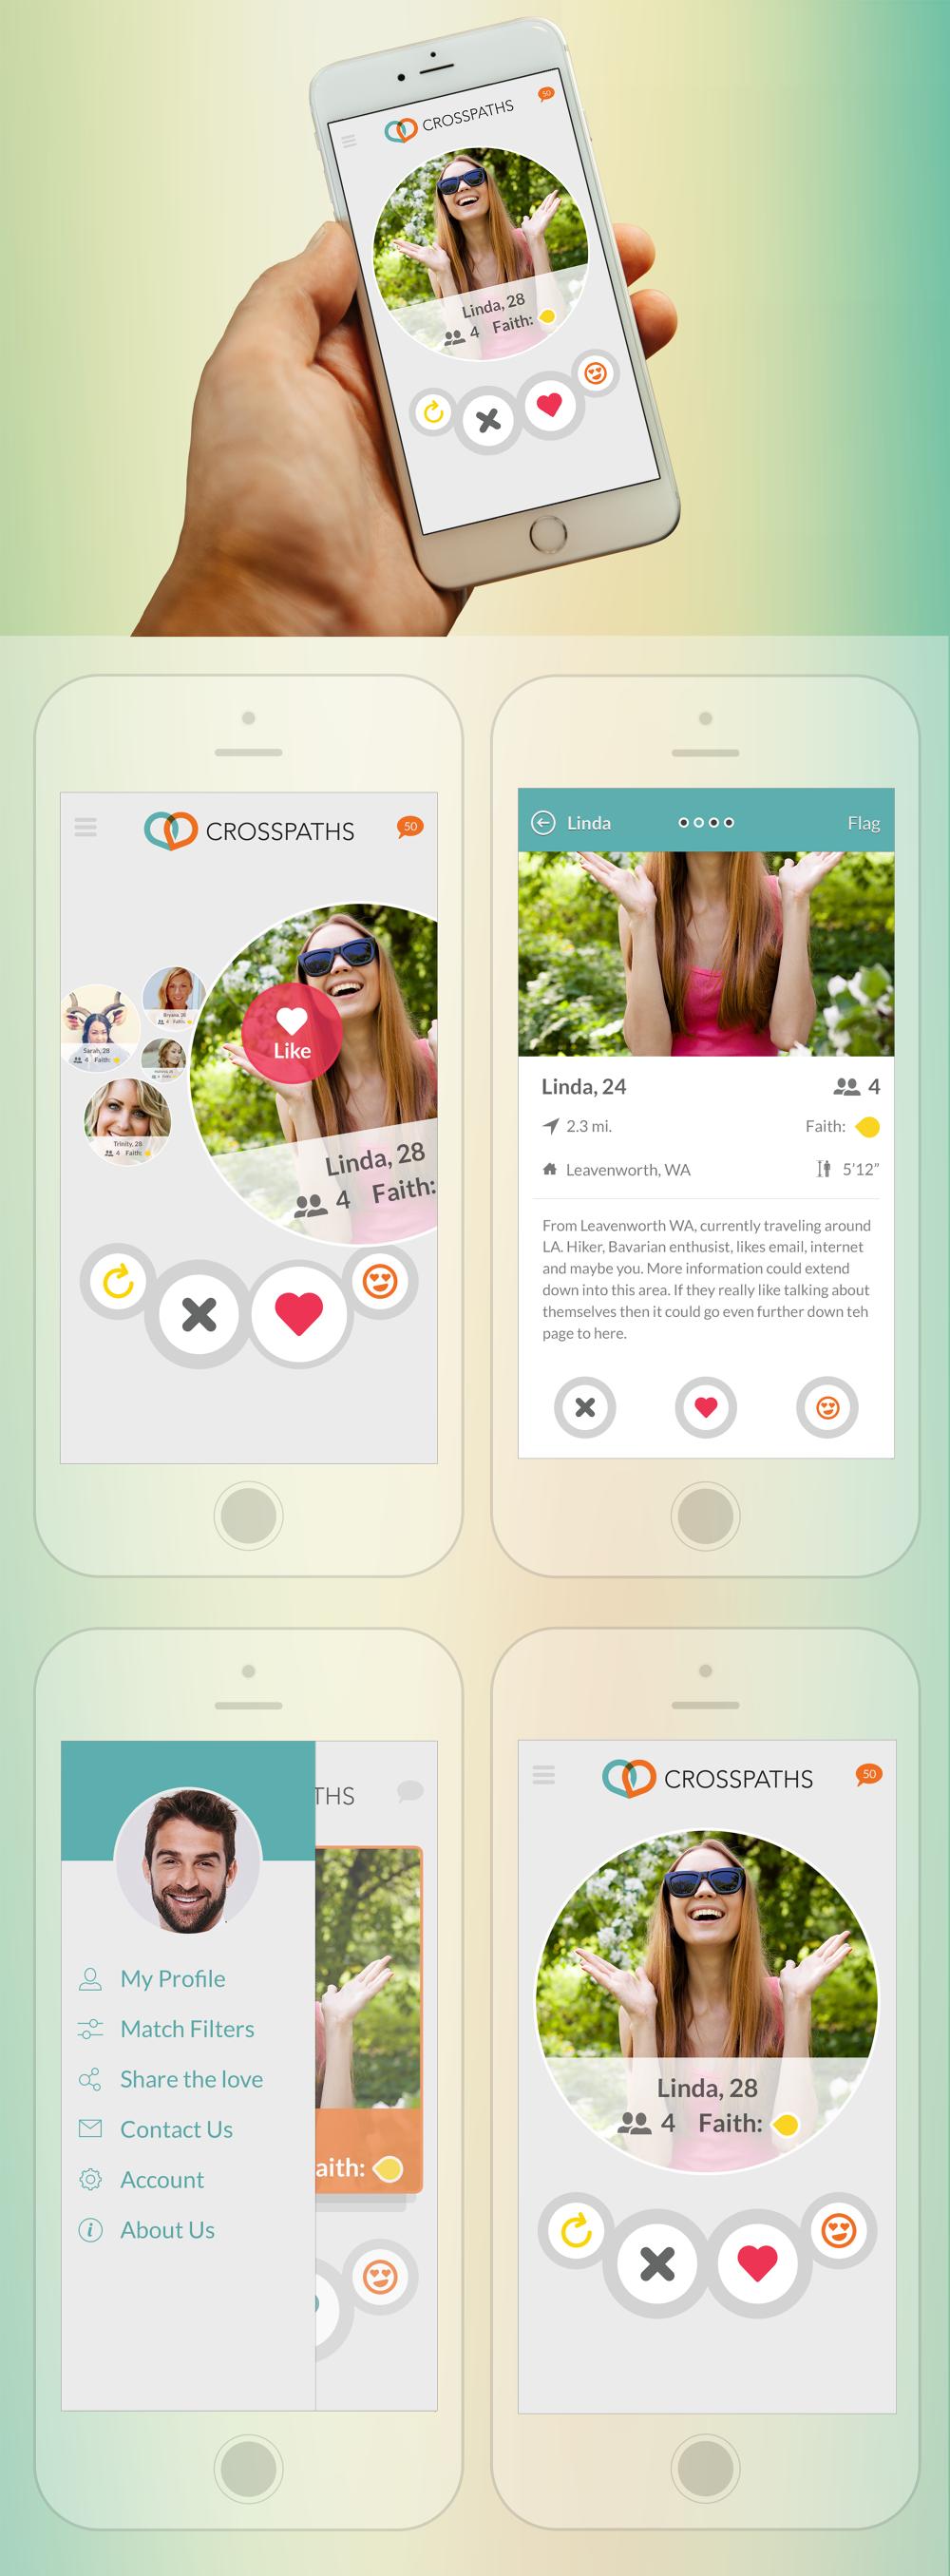 crosspath dating app